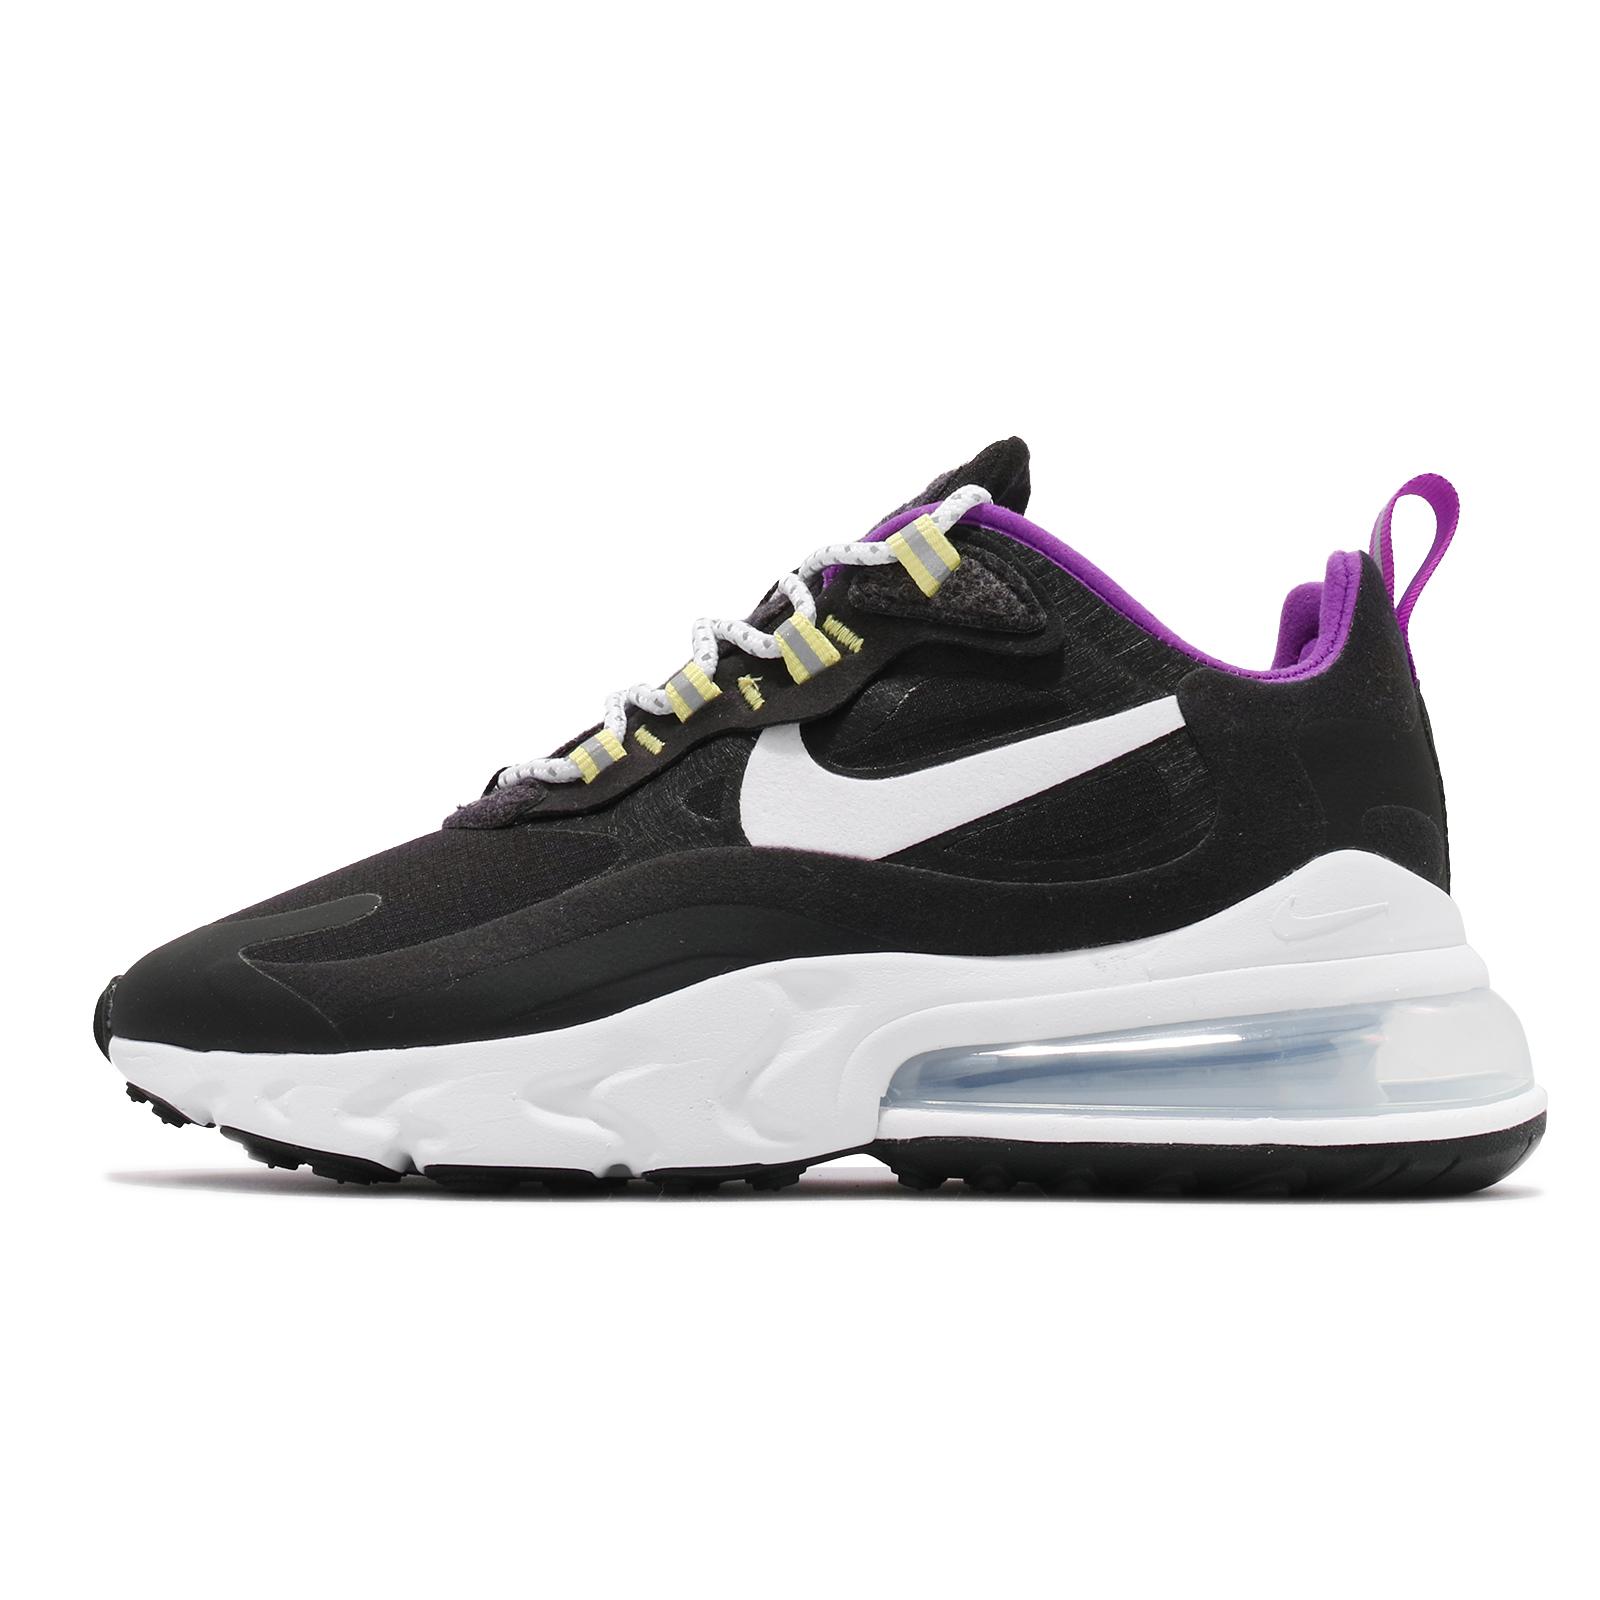 Nike 休閒鞋 Air Max 270 React SE 黑白 紫 女鞋 厚底 大氣墊【ACS】 CV7956-011